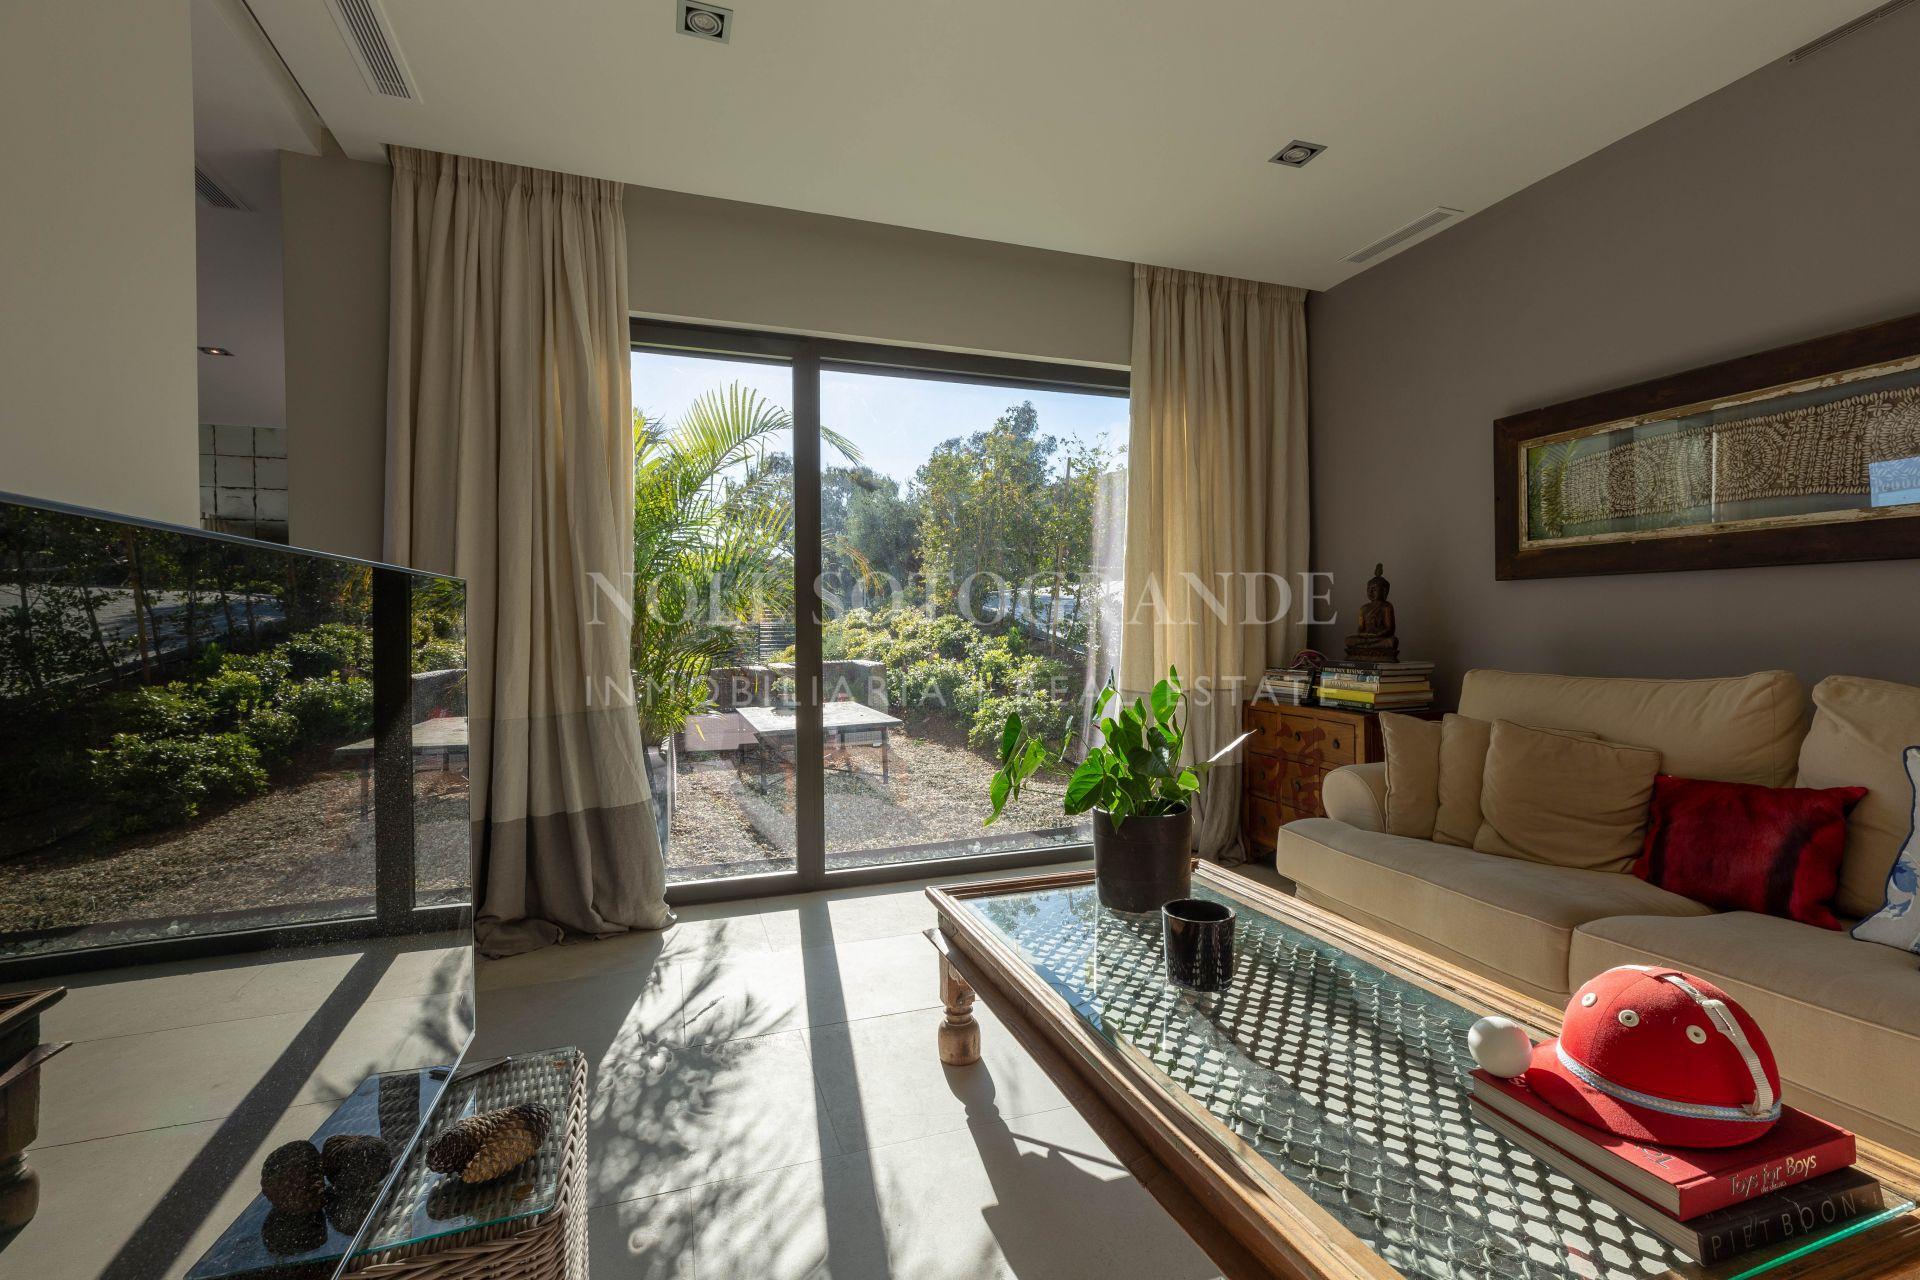 Sotogrande, La Reserva de Sotogrande, New family villa for rent